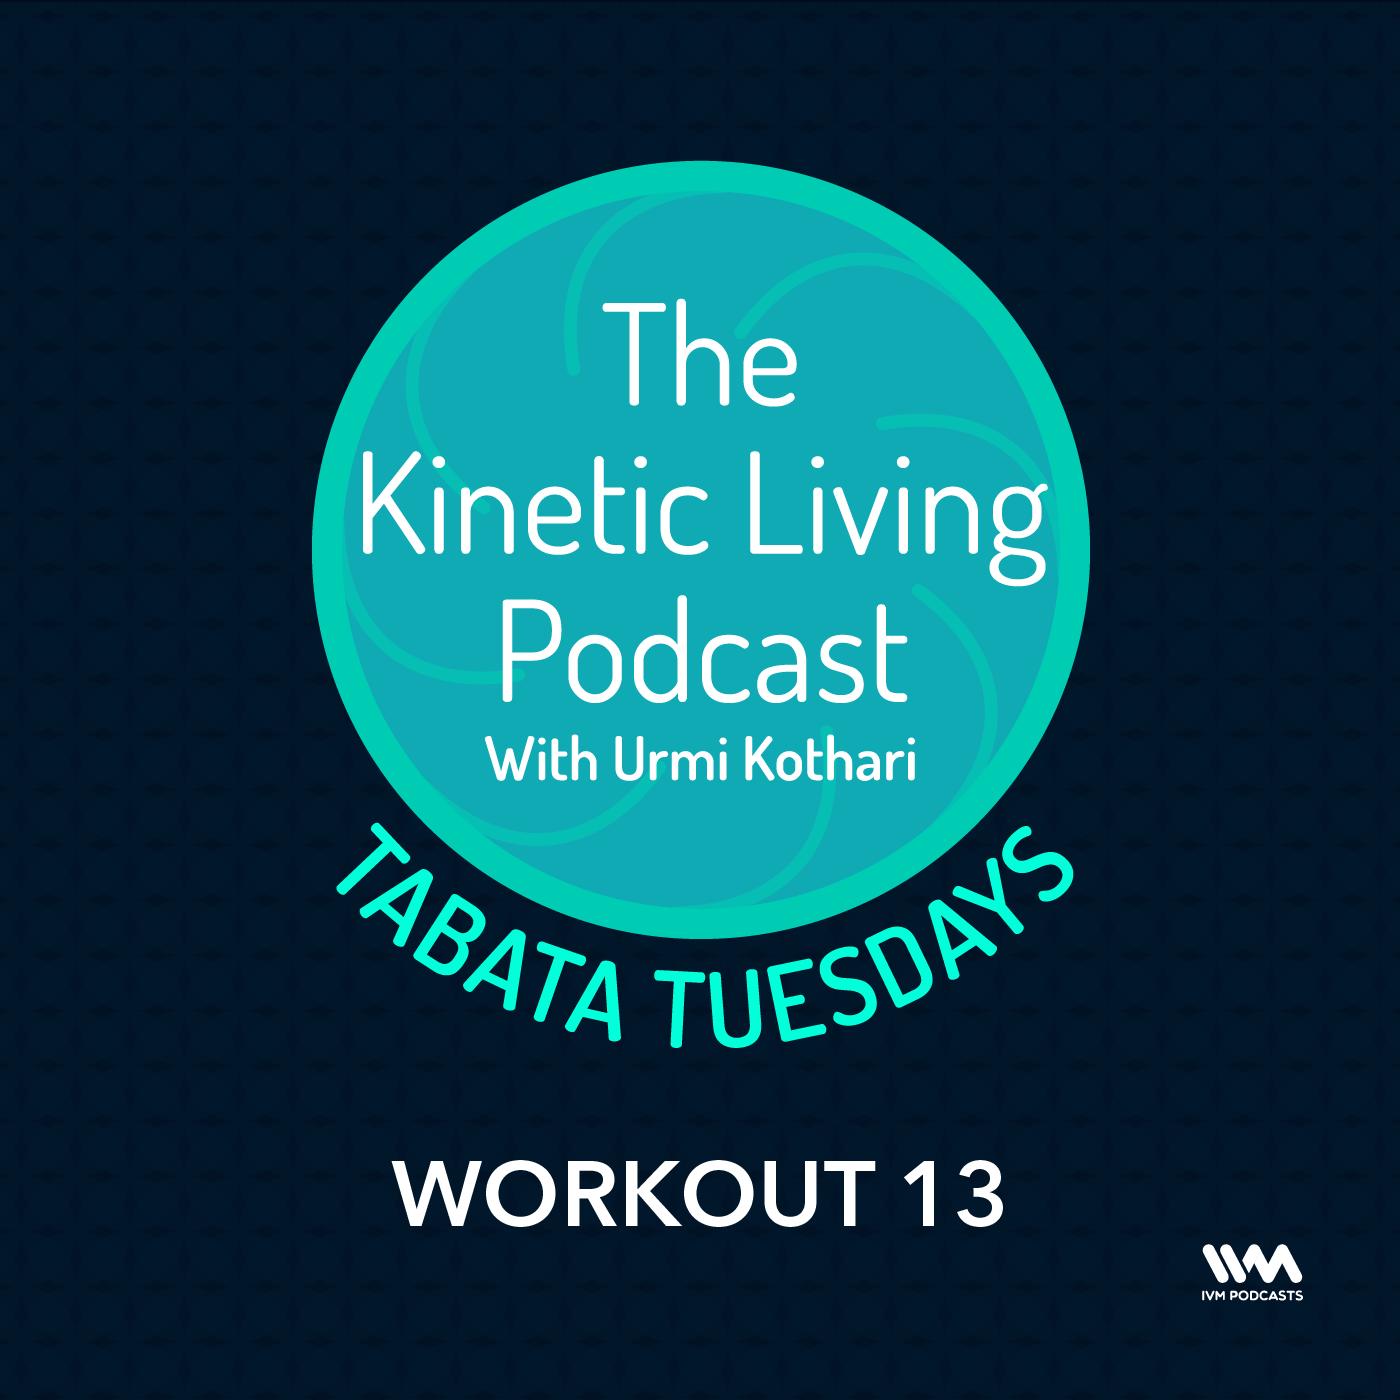 S02 E13: Tabata Tuesday: Workout 13